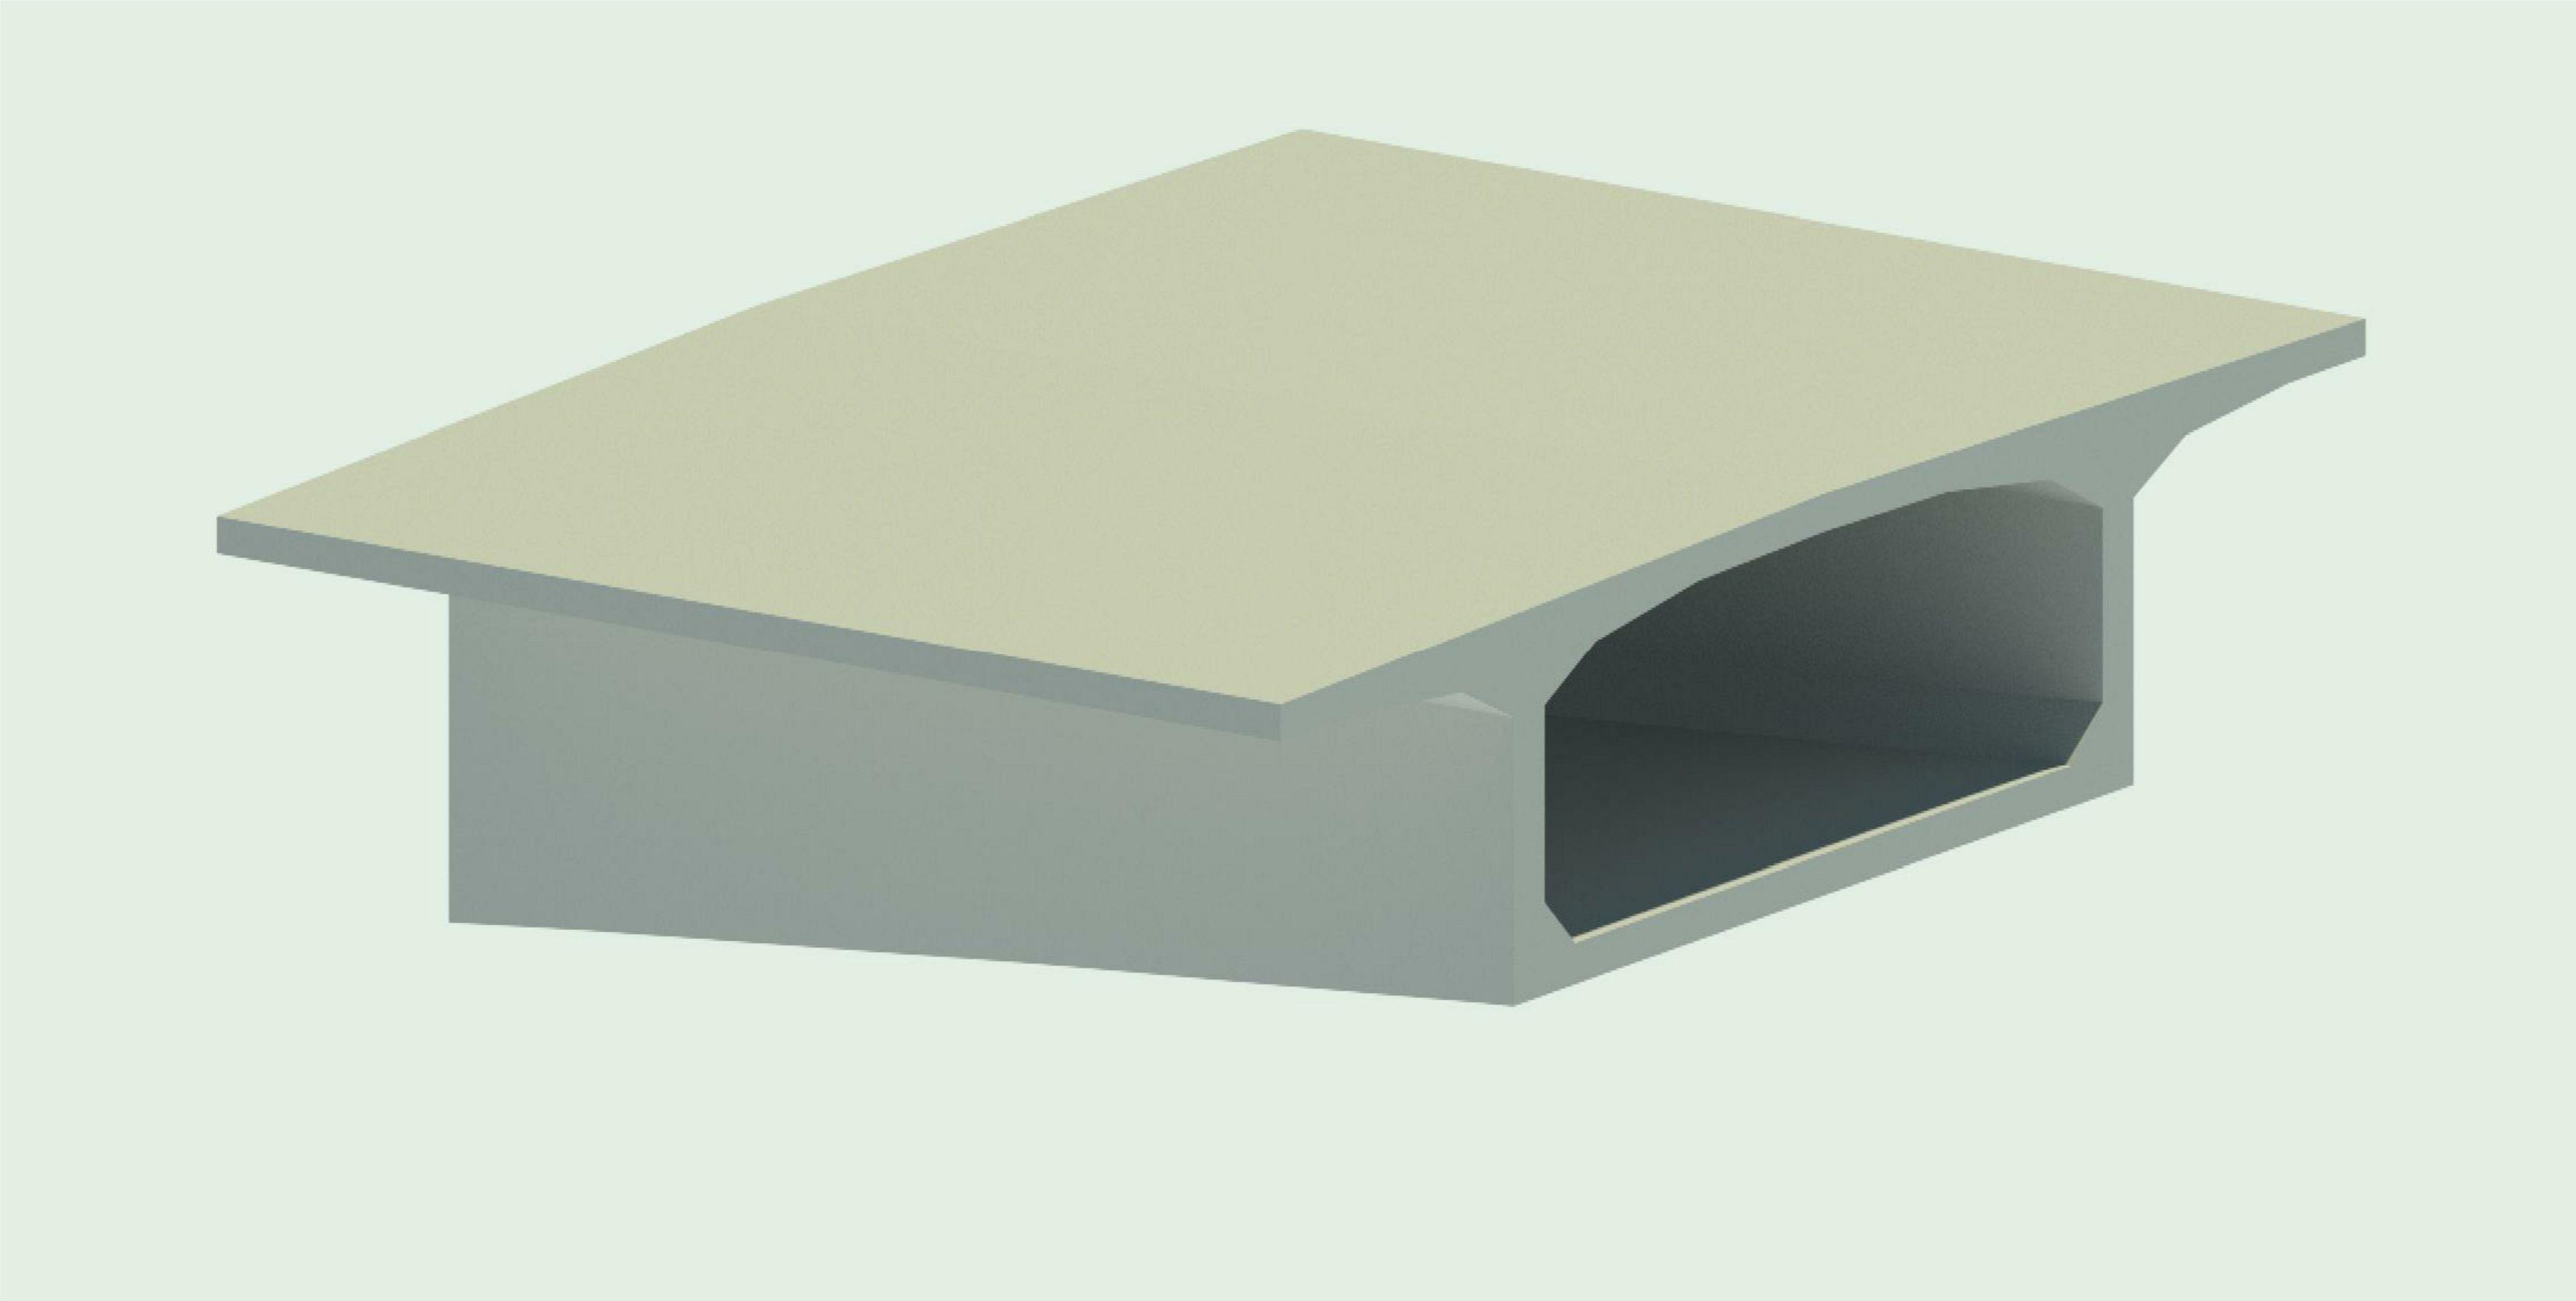 Render---renderizacion---render-dovelas-1-2-3-3500-3500